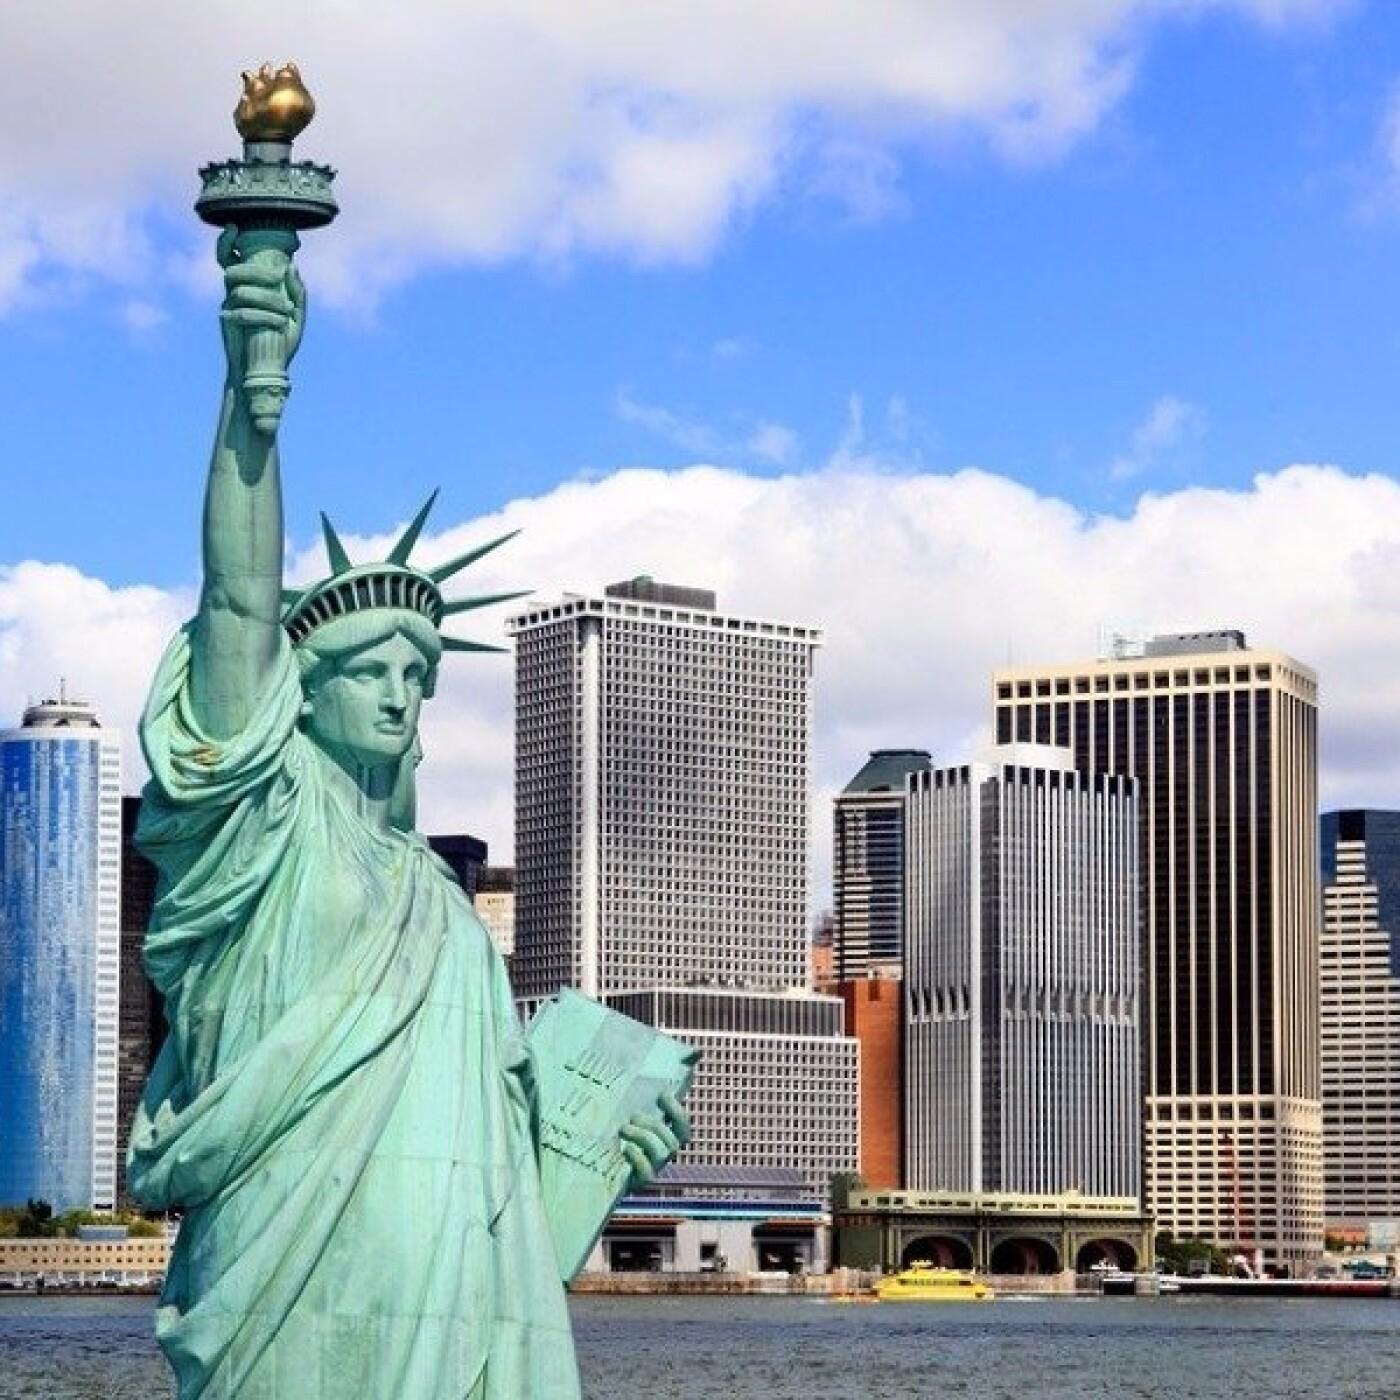 5 Applis pratiques pour visiter New York - 20 10 2021 - StereoChic Radio